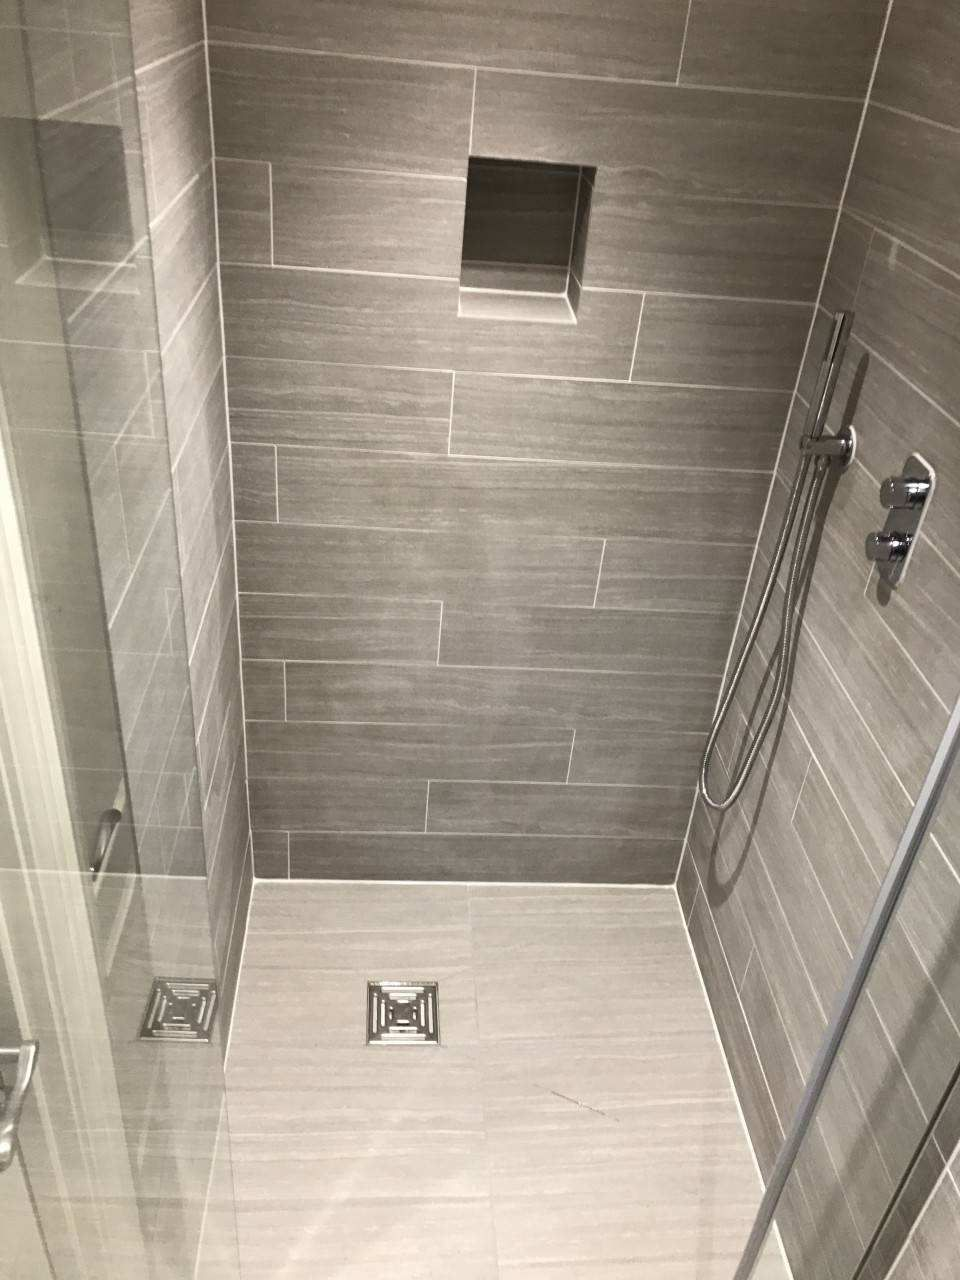 En Suite Shower Room Ideas En Suite Shower Room To Wet Room Marchbank Bathrooms Bathroom Tile Inspiration Modern Bathroom Tile Ensuite Bathroom Designs Ensuite bathroom design ideas